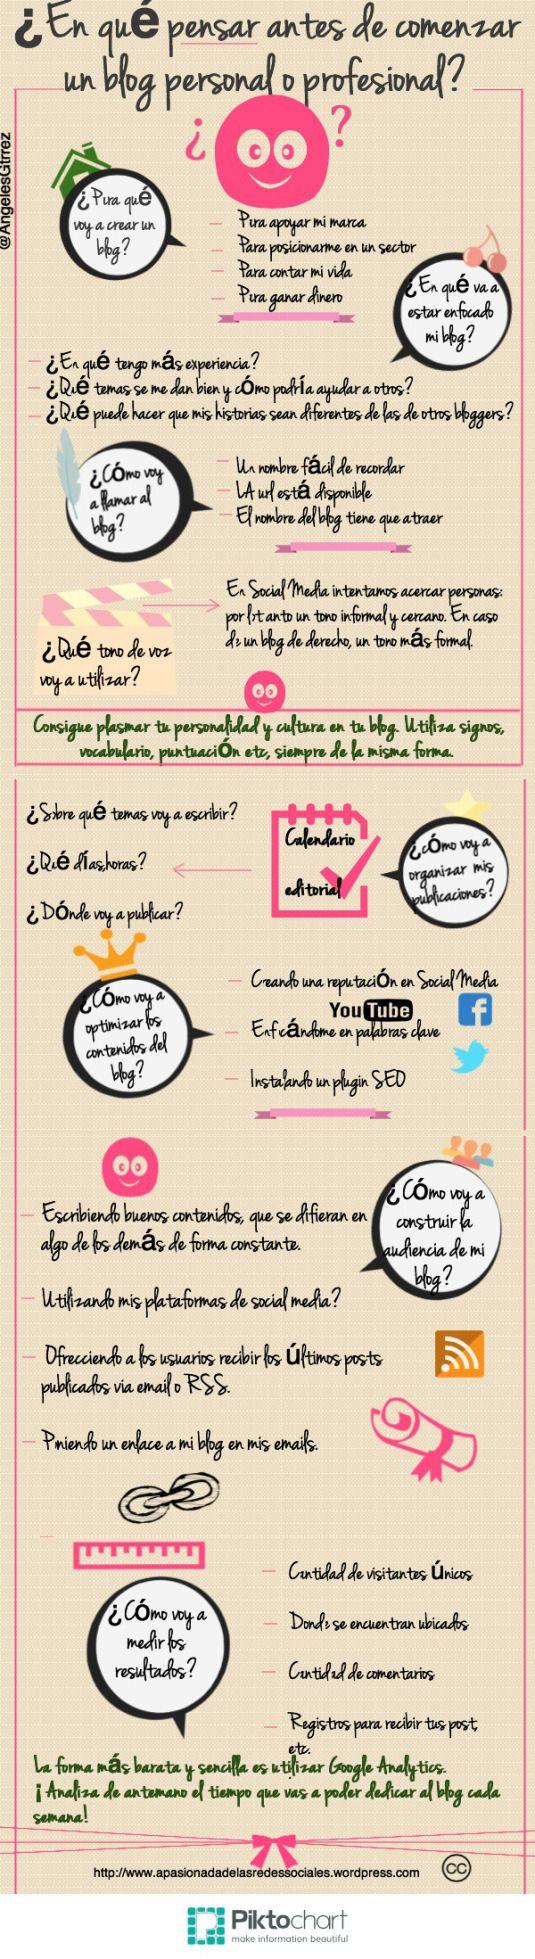 #Infografia #CommunityManager Qué pensar antes de crear un blog. #TAVnews